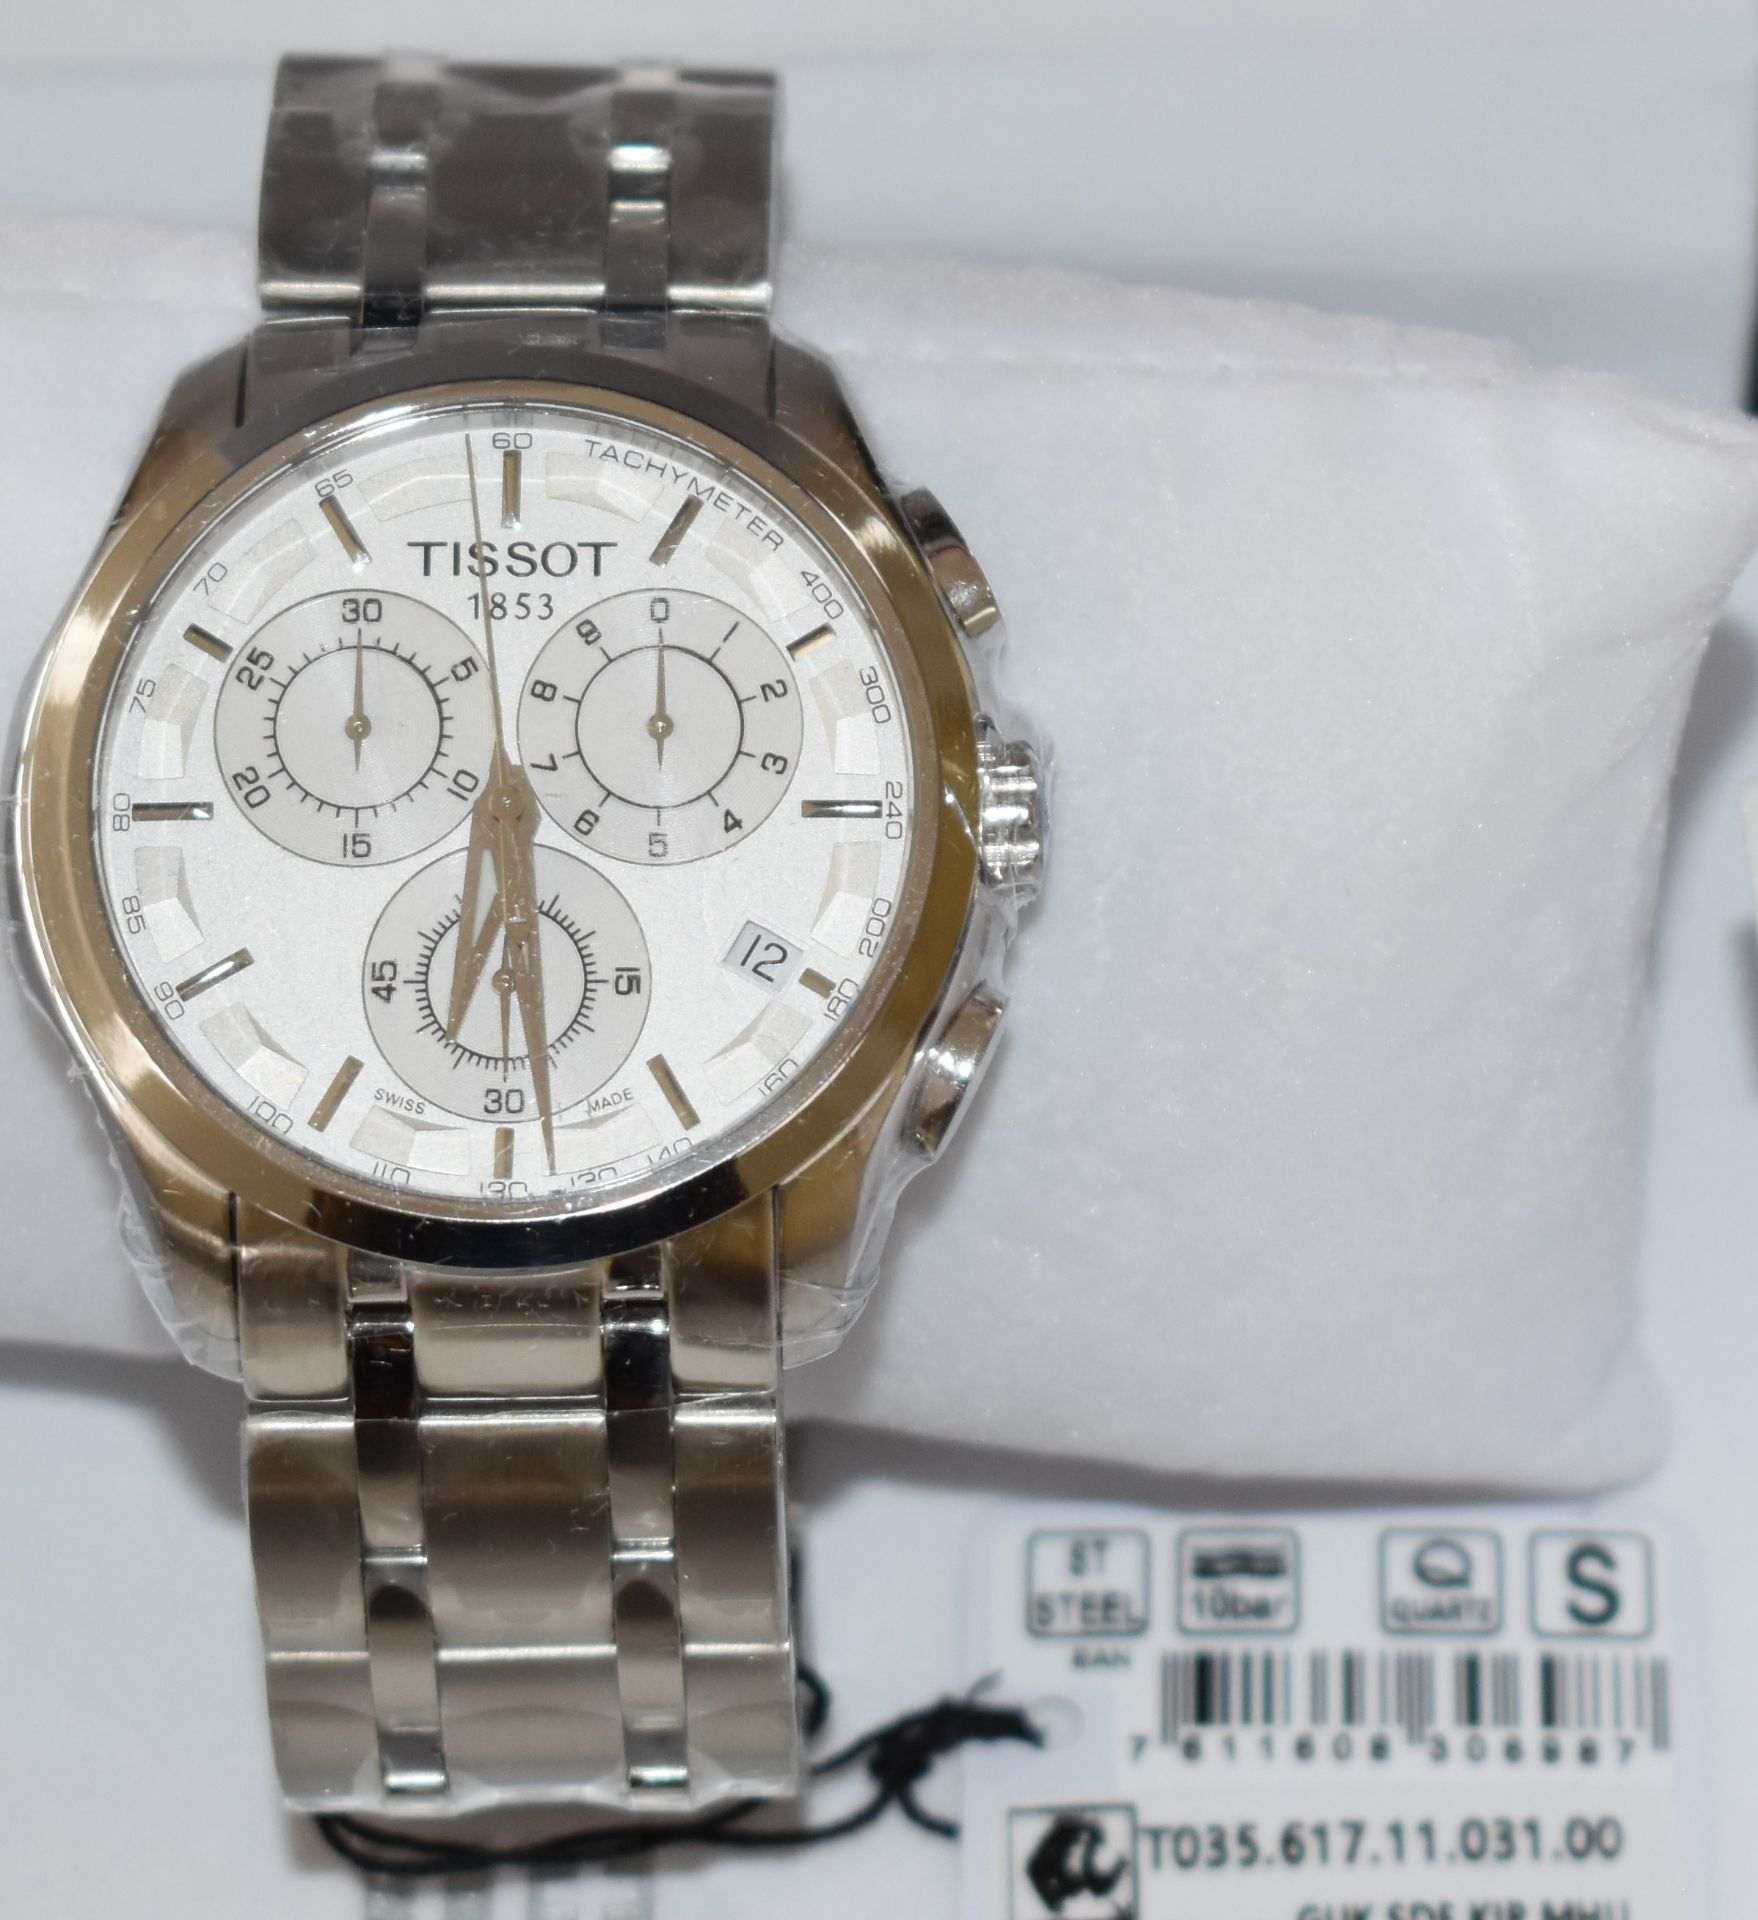 Tissot Men's Watch TO35.617.11.031.00 - Image 2 of 3